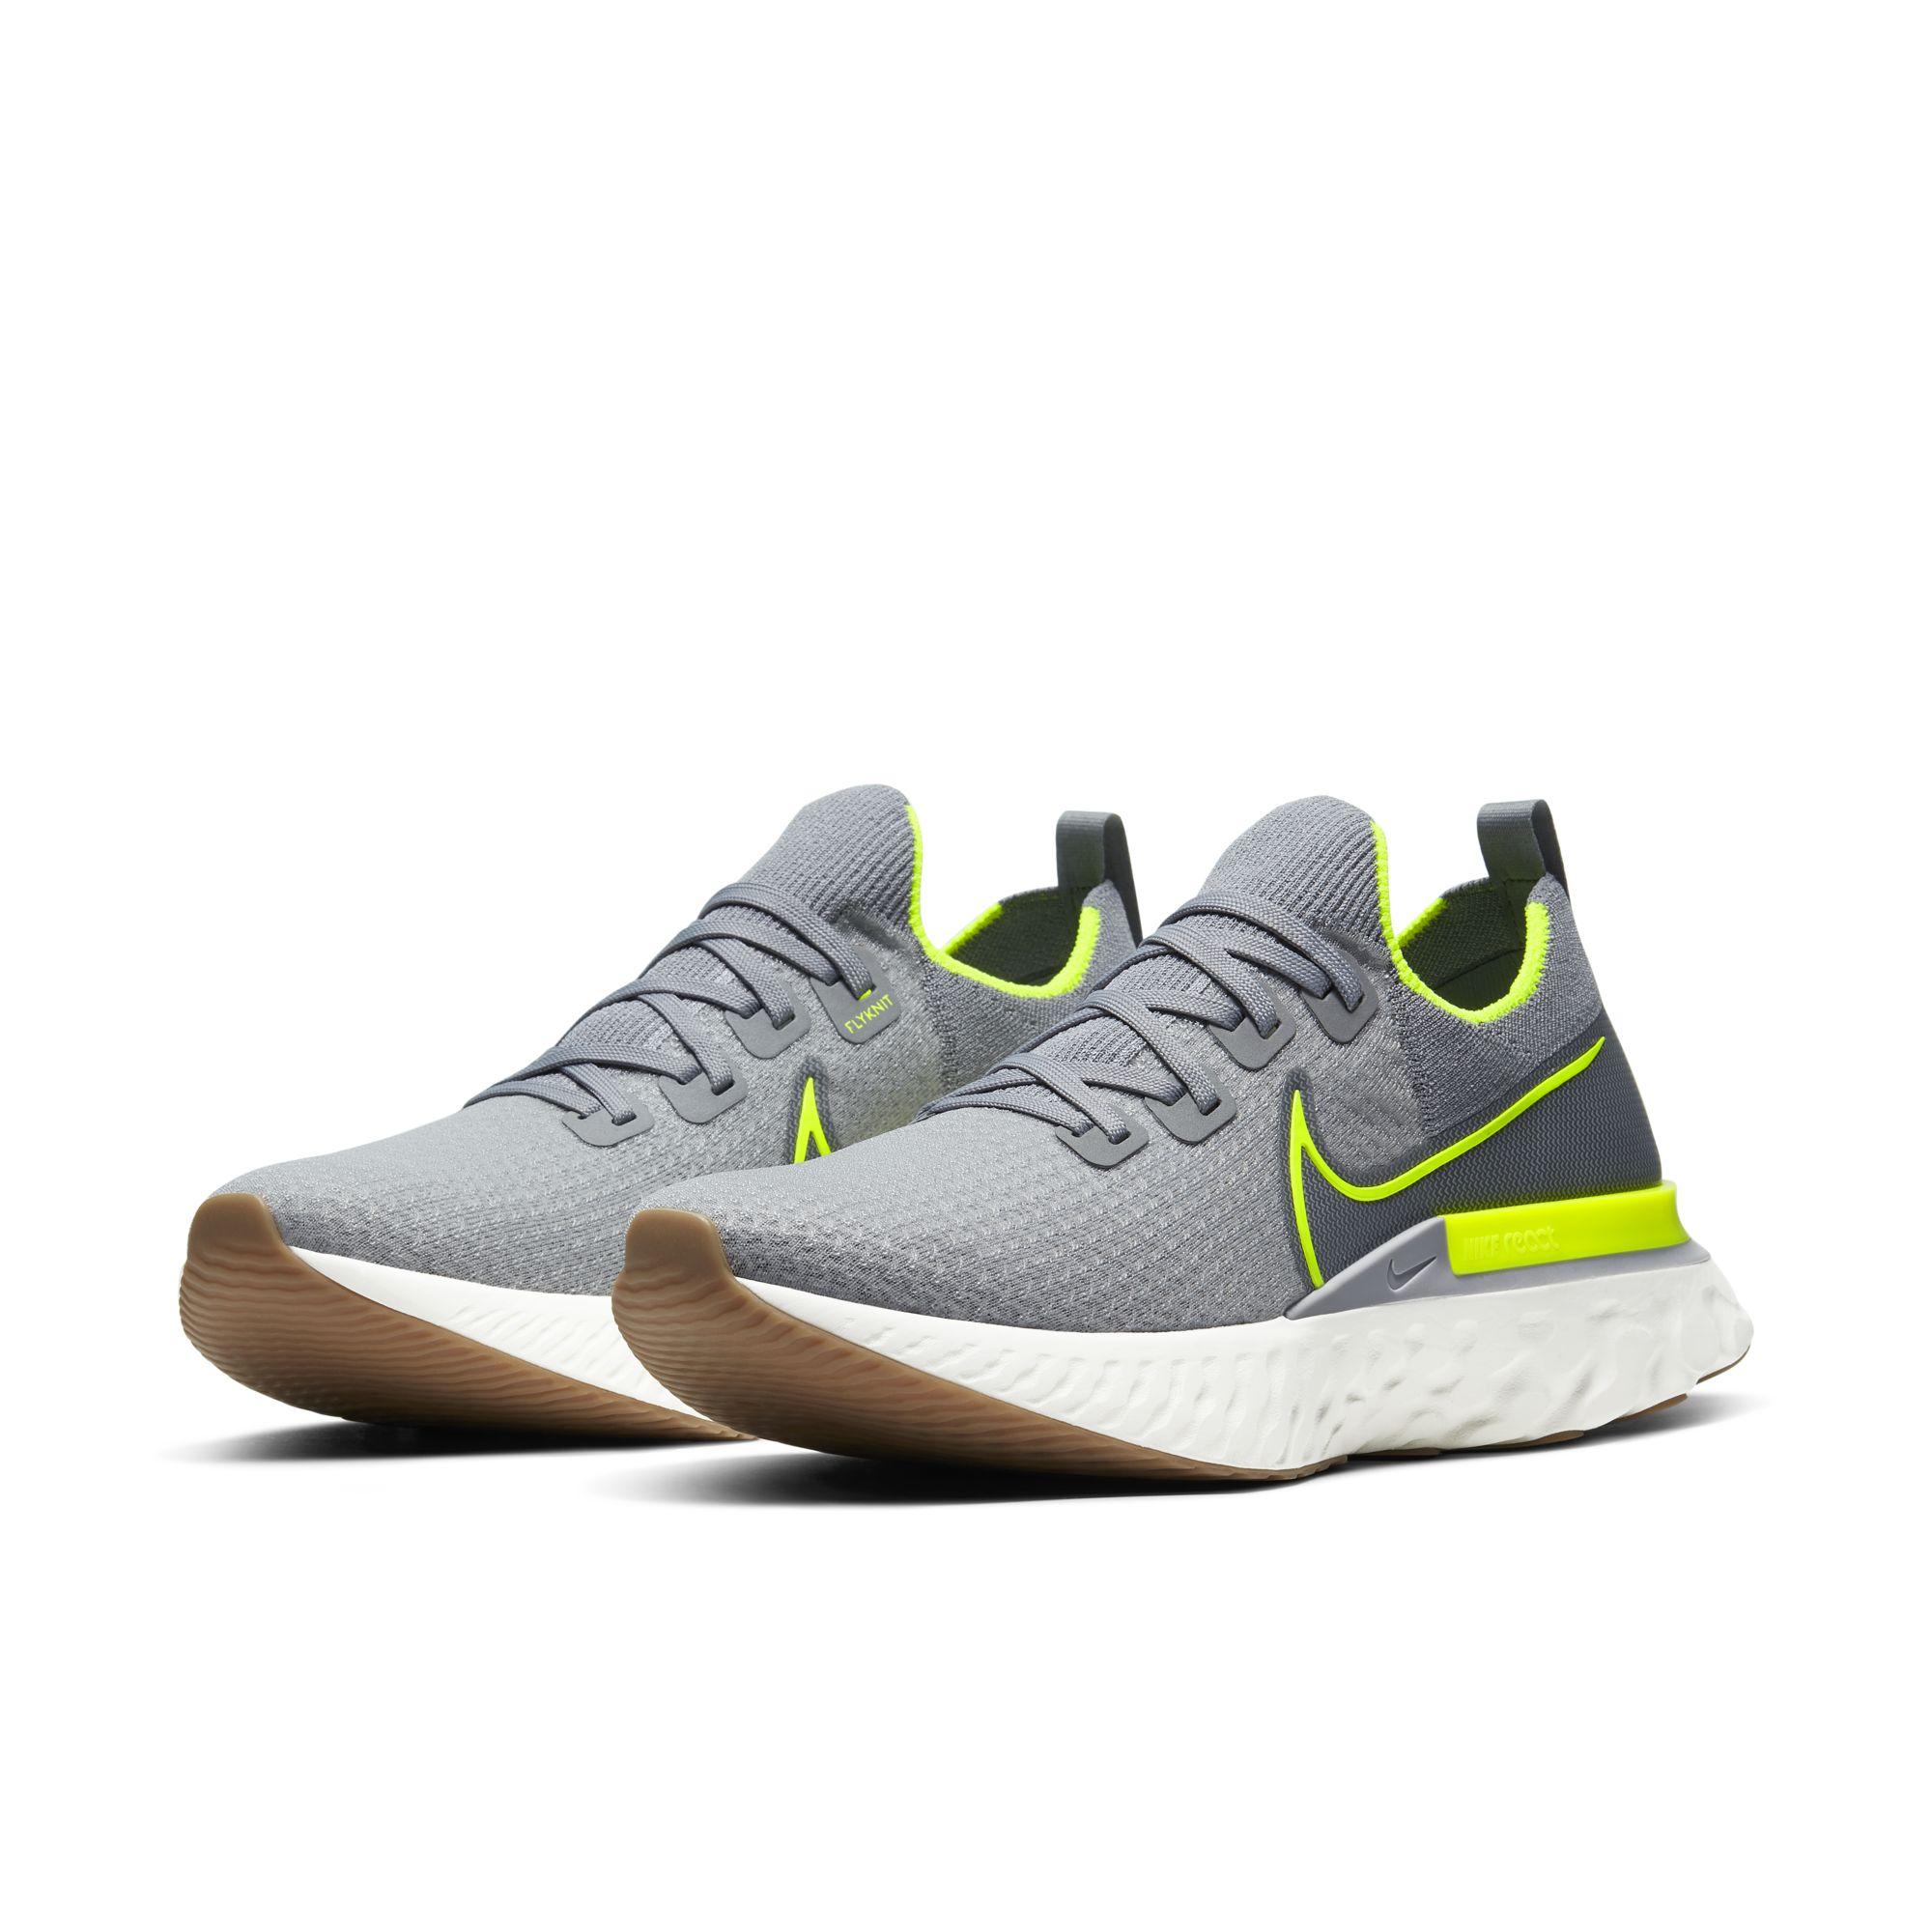 Nike,Infinity React Run 融入经典配色方案!Nike Infinity React Run 三款新品曝光!